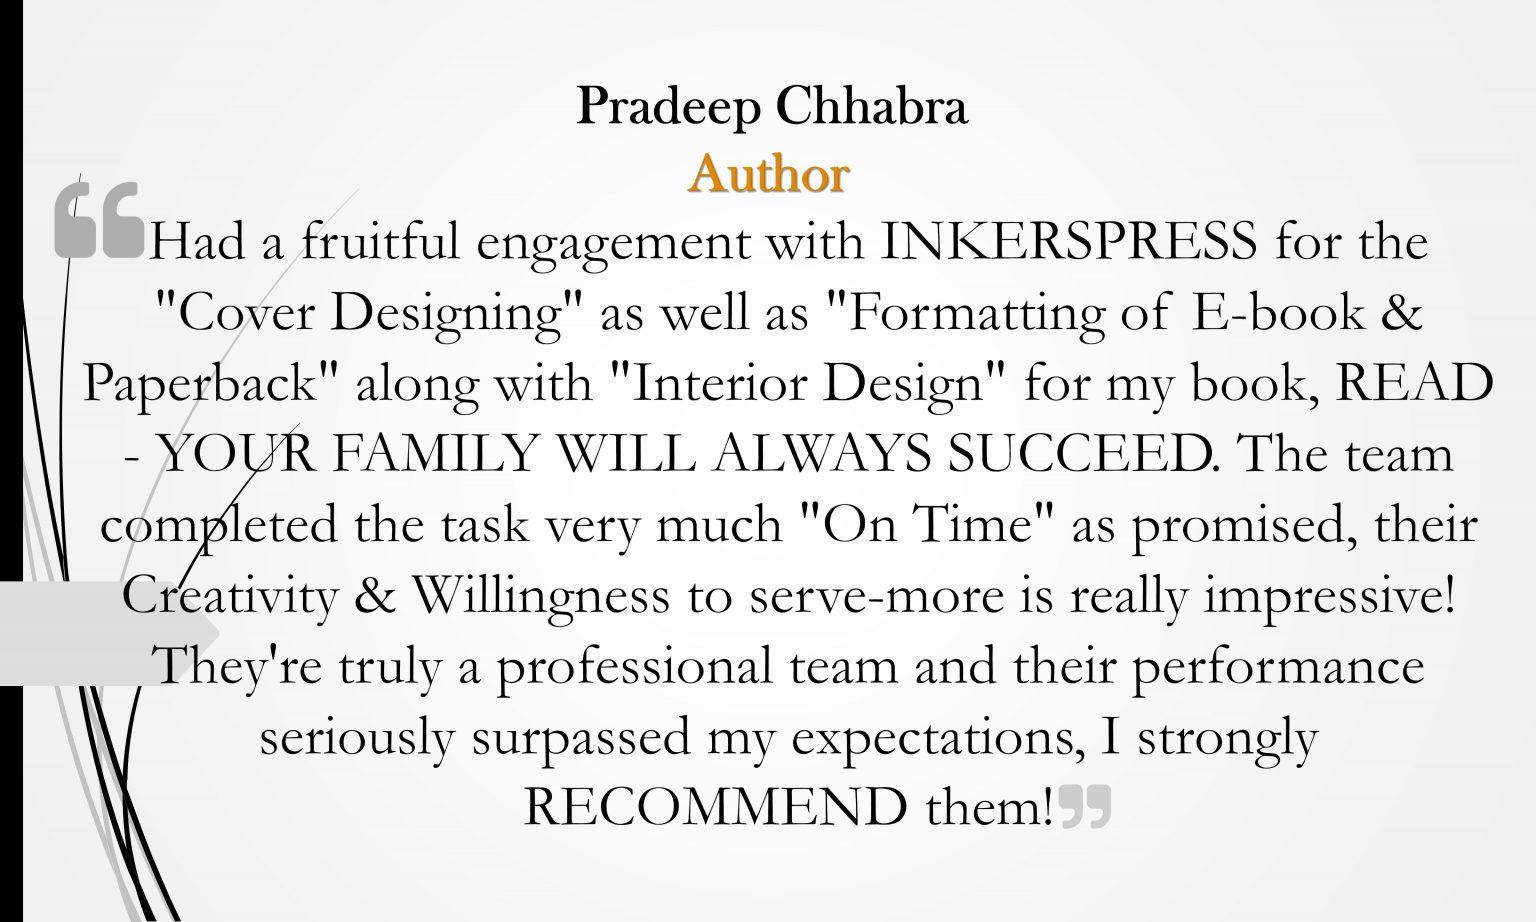 Pradeep Chhabra